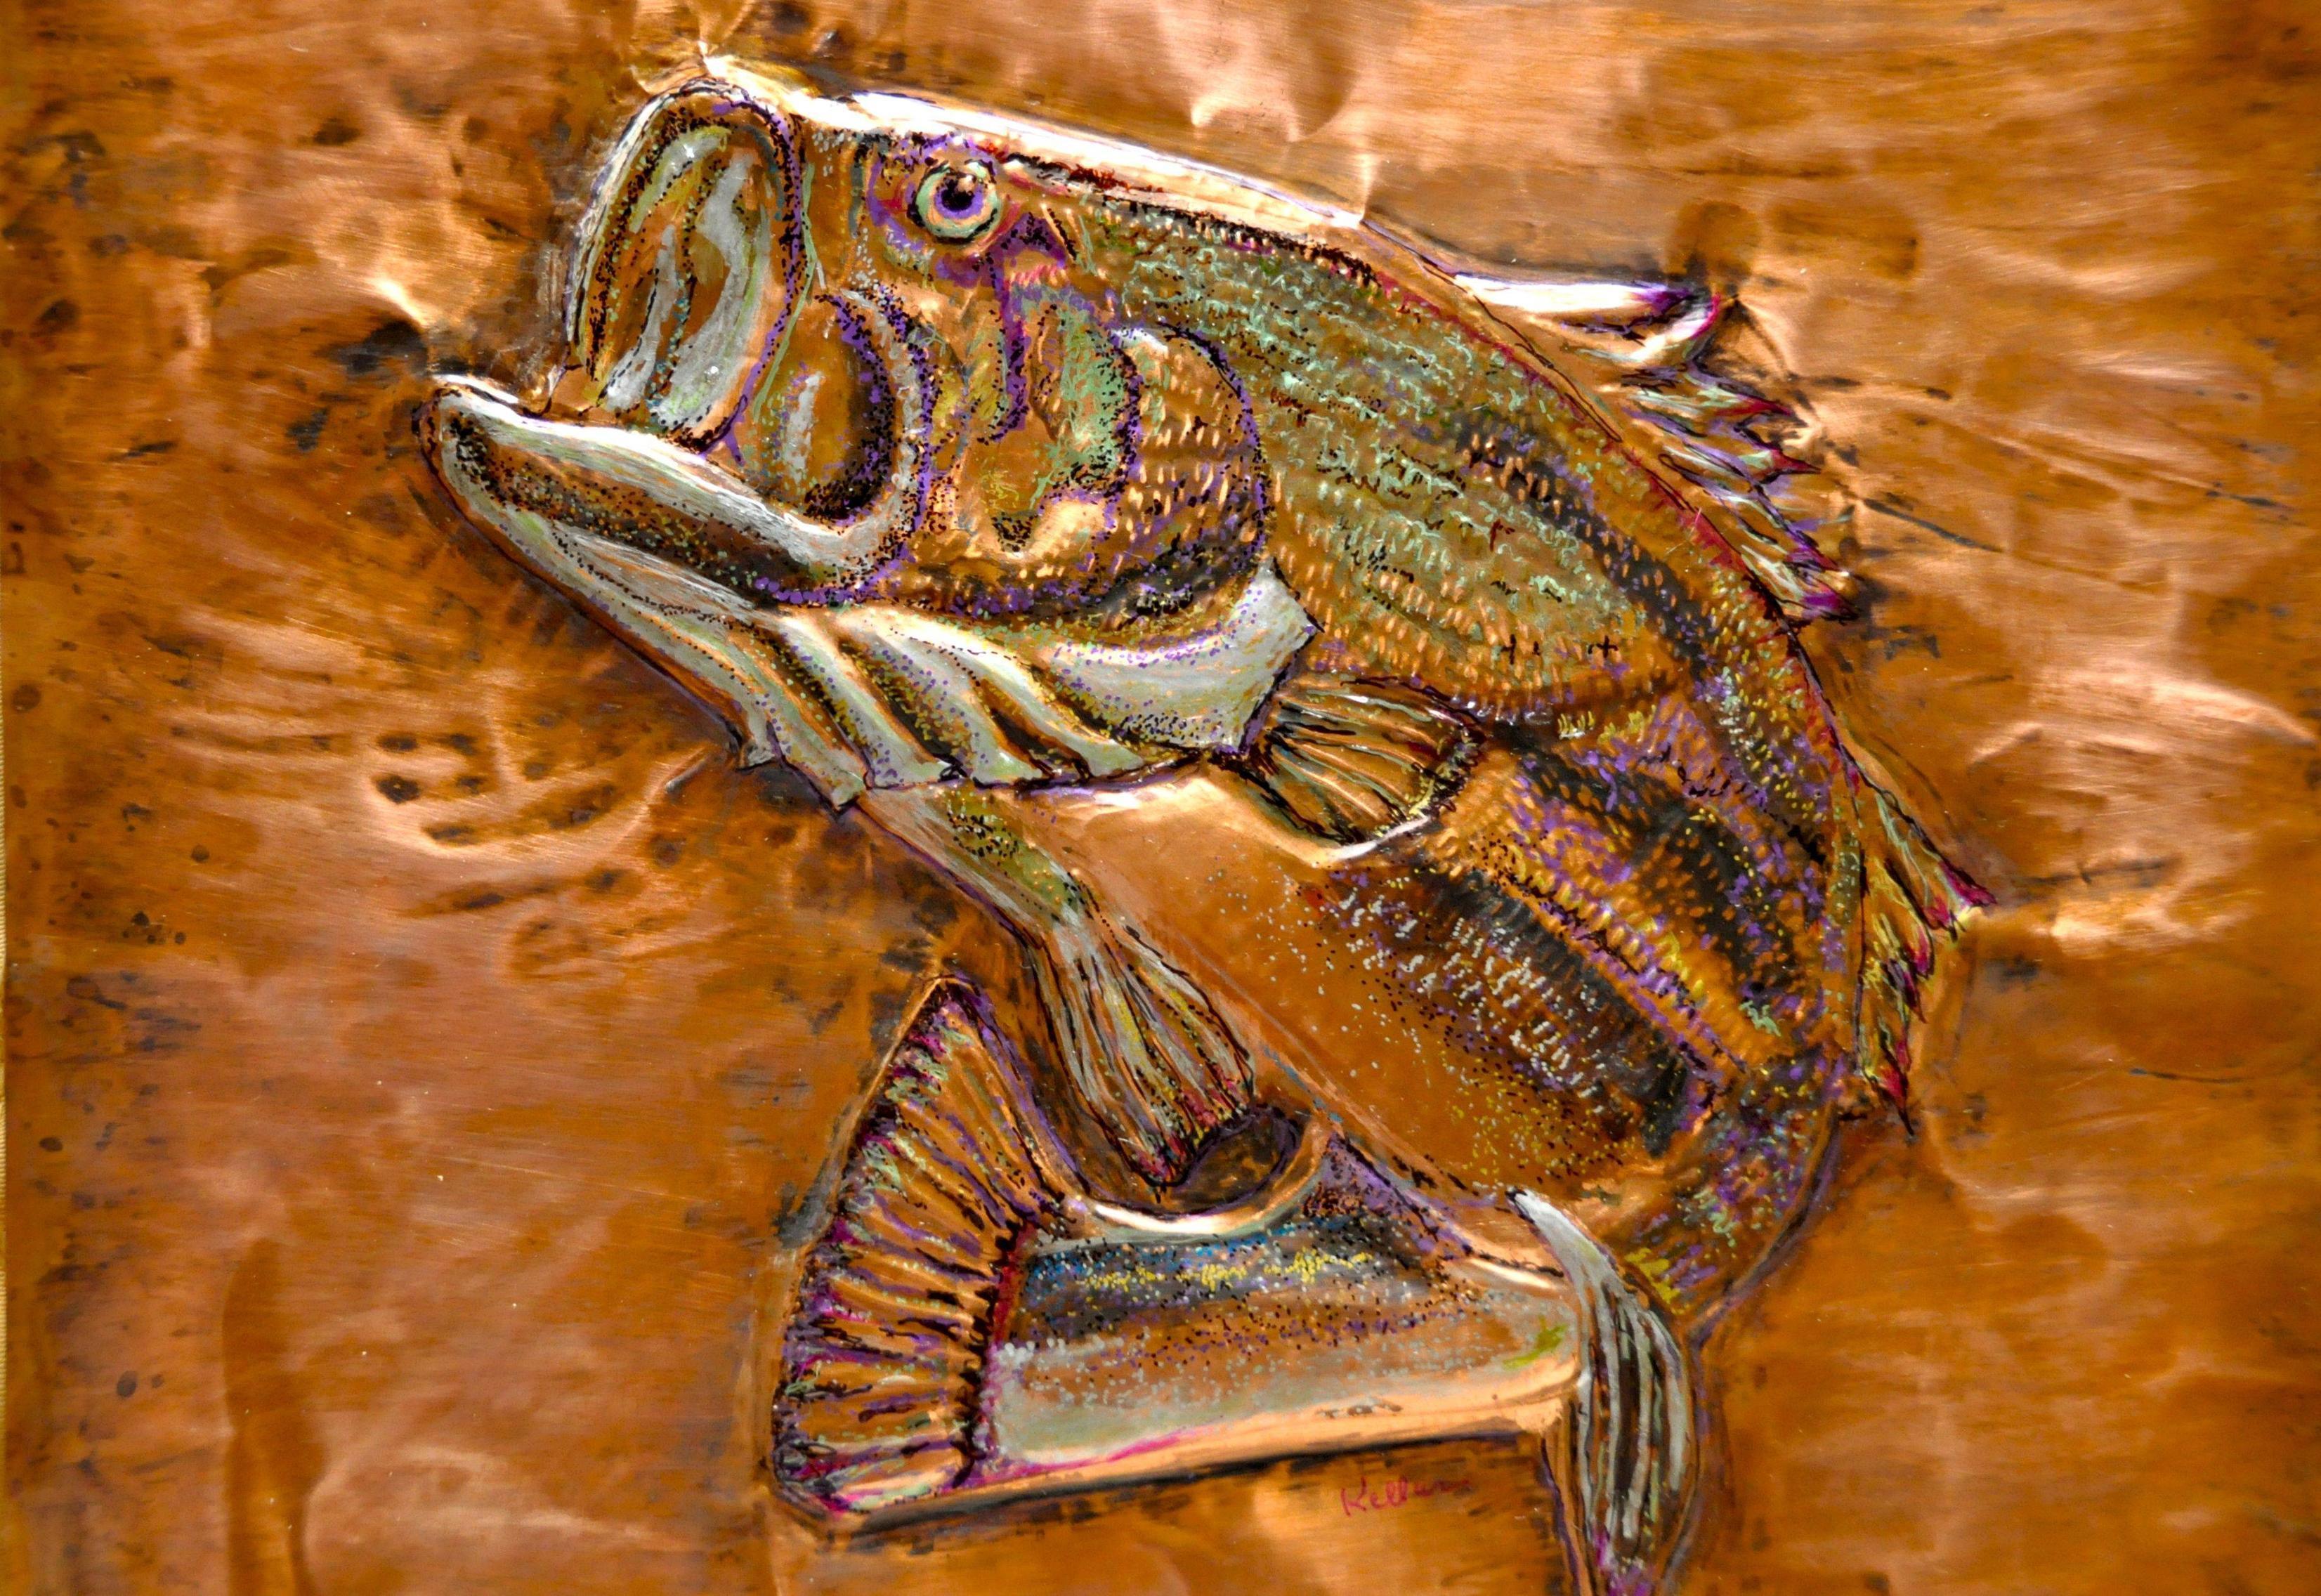 largemouth bass wallpaper - photo #33